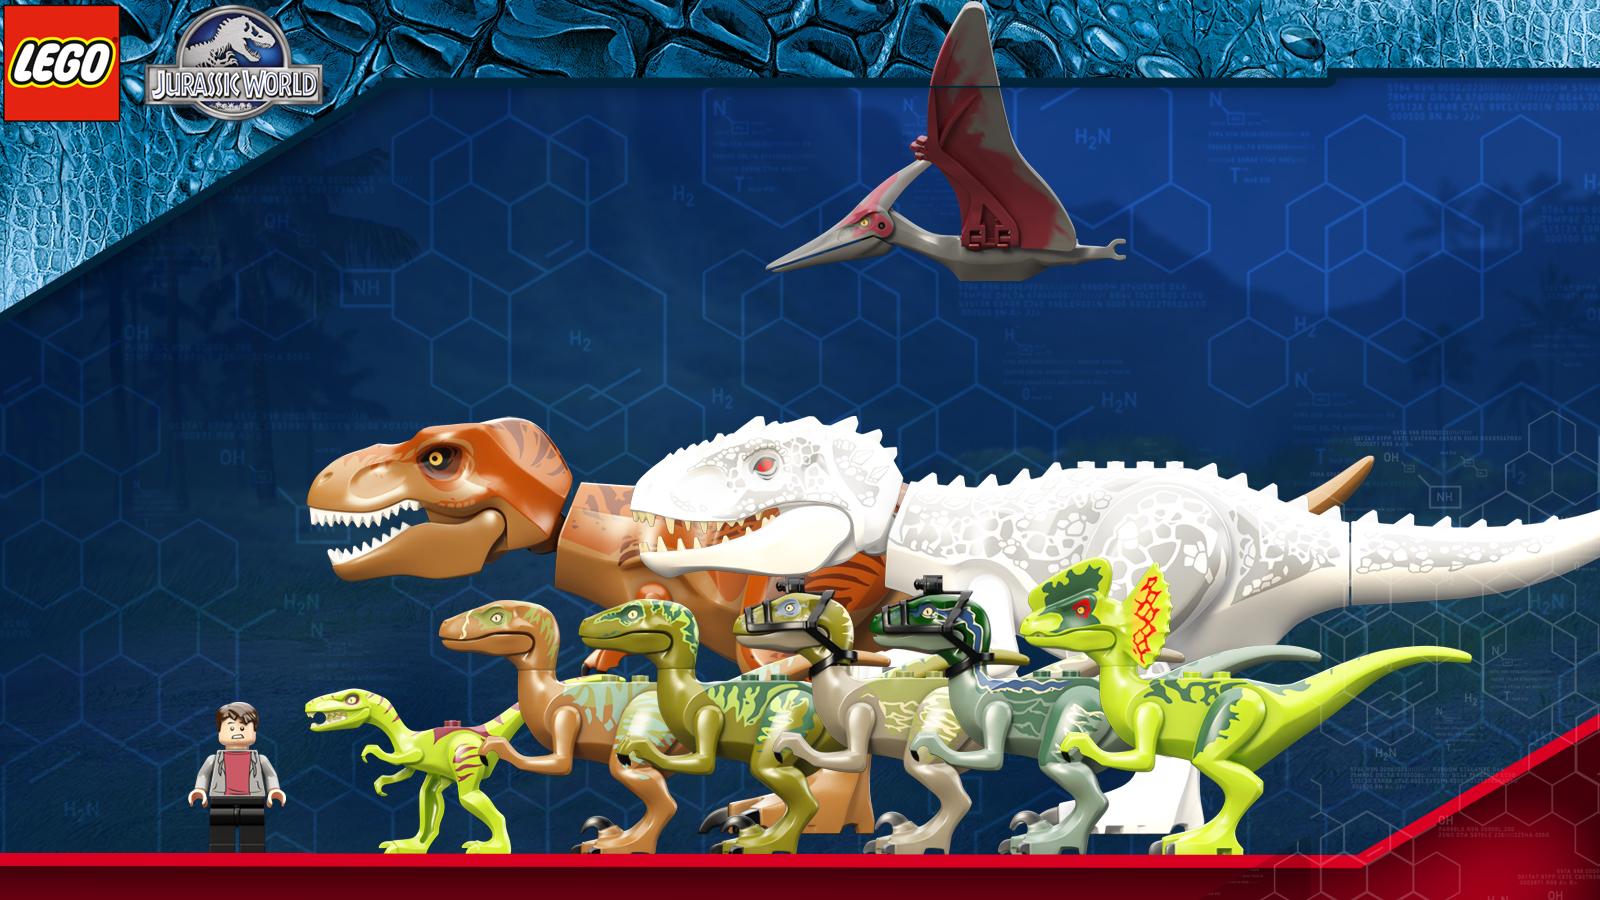 Kleurplaten Lego Jurassic World.Coloring Pages Lego Kingdom Printable Bwwm Team Coloring